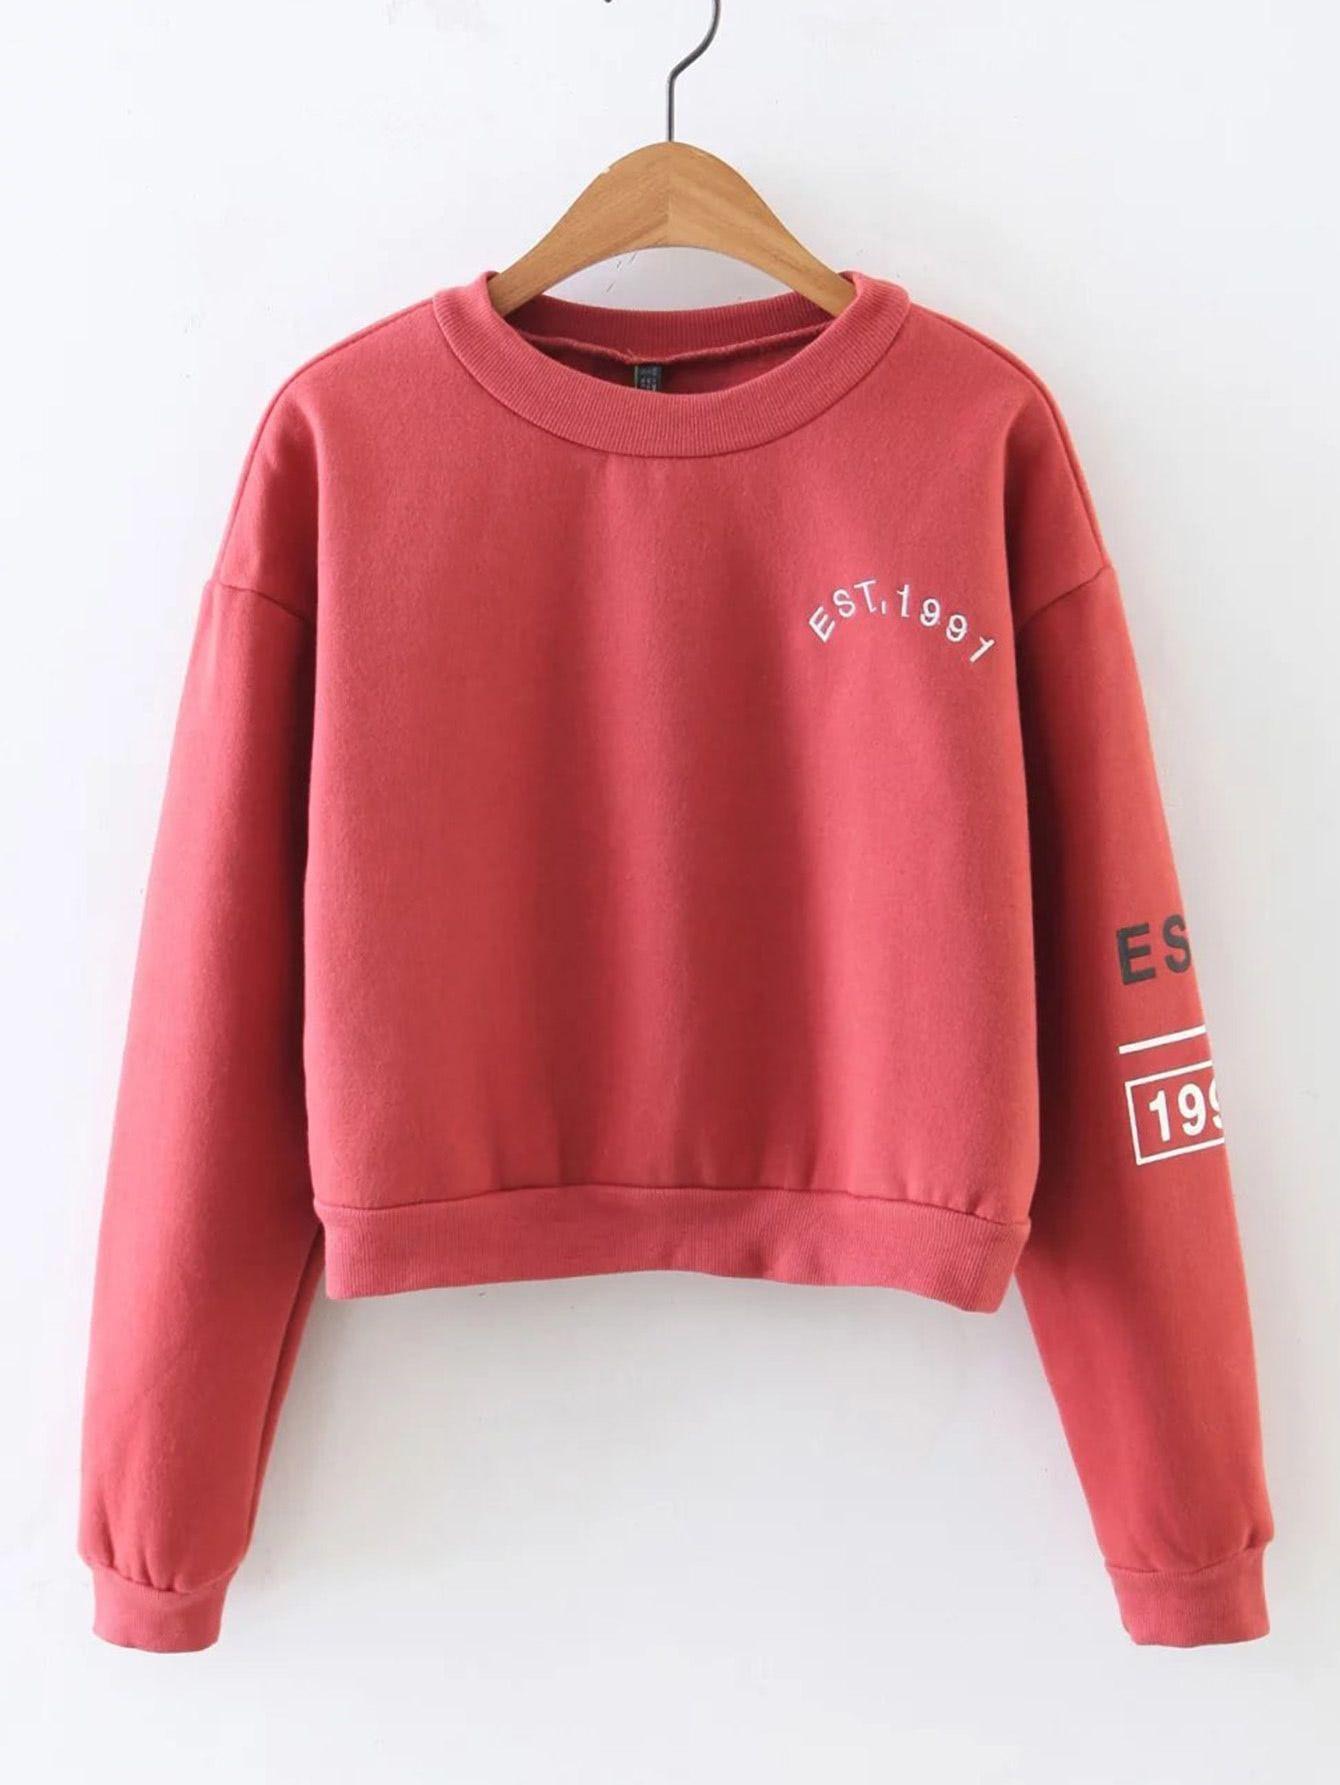 Pin by pingu4lyfe on Fashion | Pinterest | Sweatshirts online ...